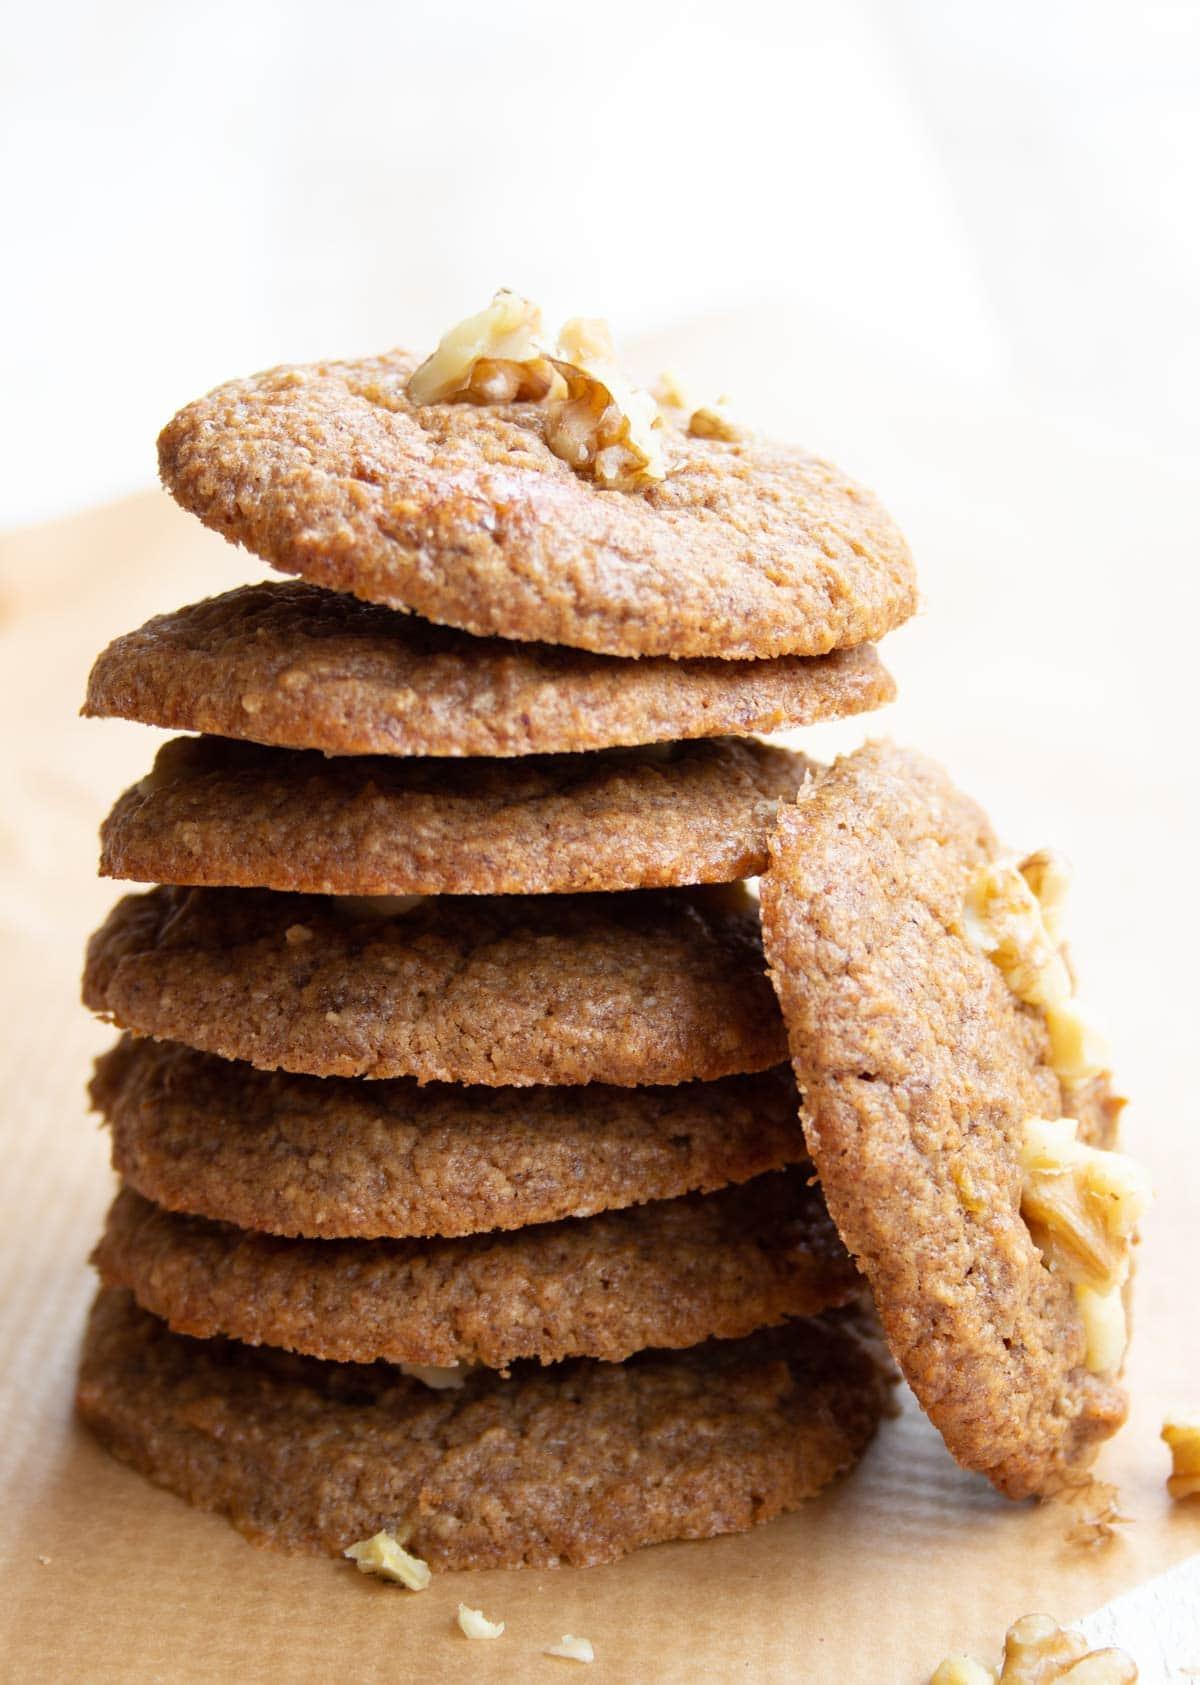 Keto Banana Cookies